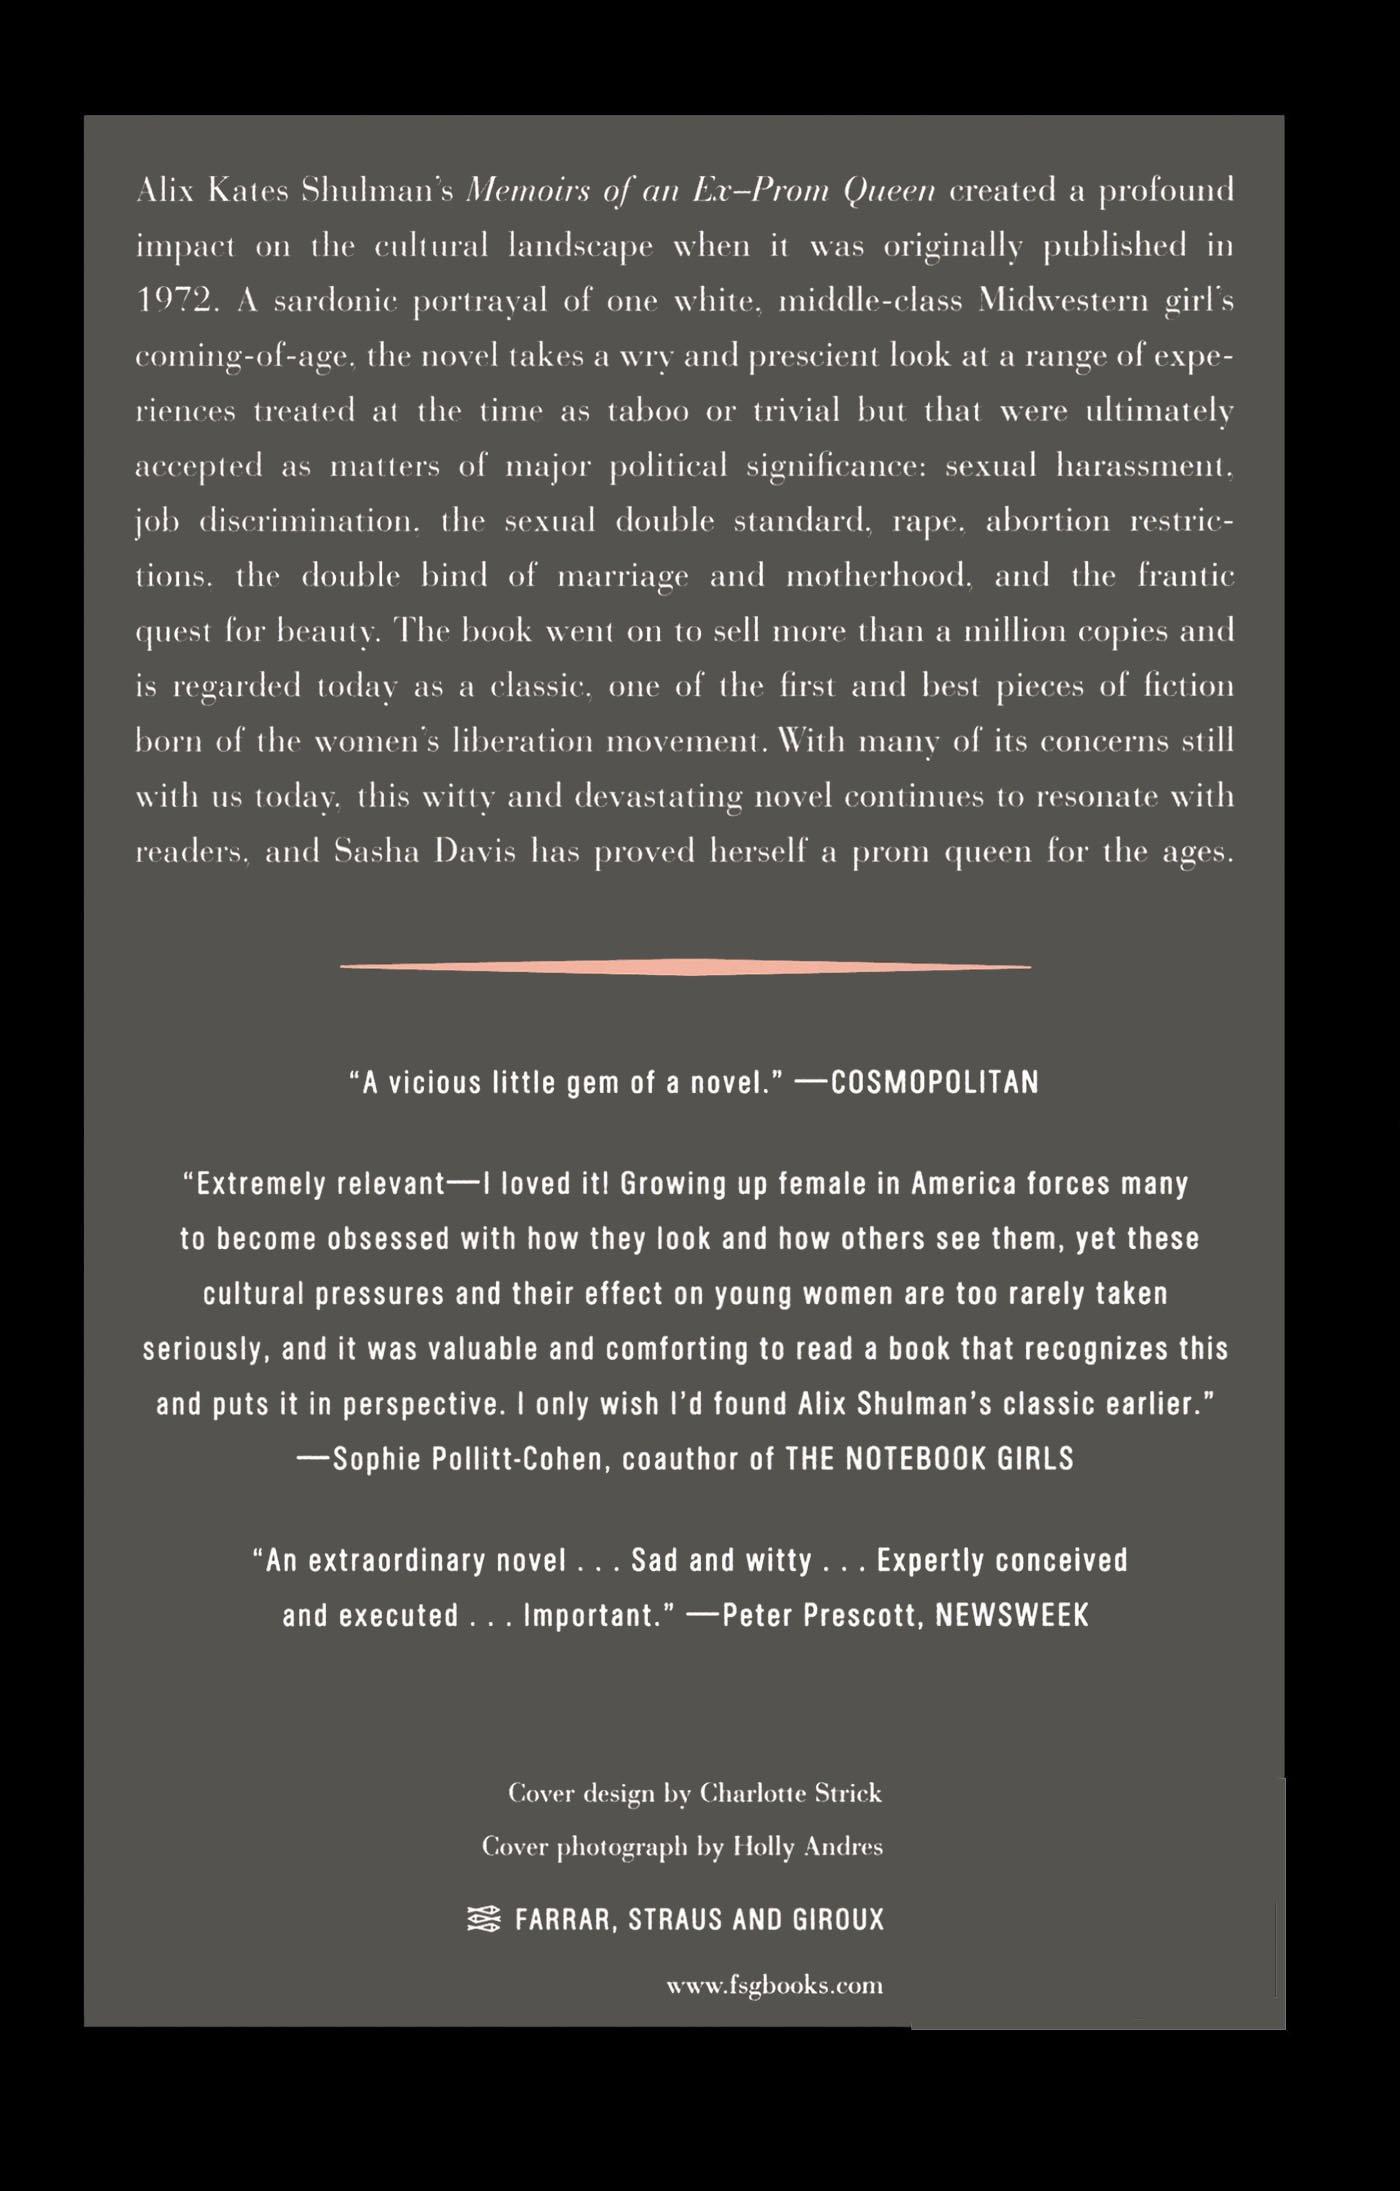 Memoirs Of An Exprom Queen: A Novel: Alix Kates Shulman, Jennifer  Baumgardner: 9780374530792: Amazon: Books